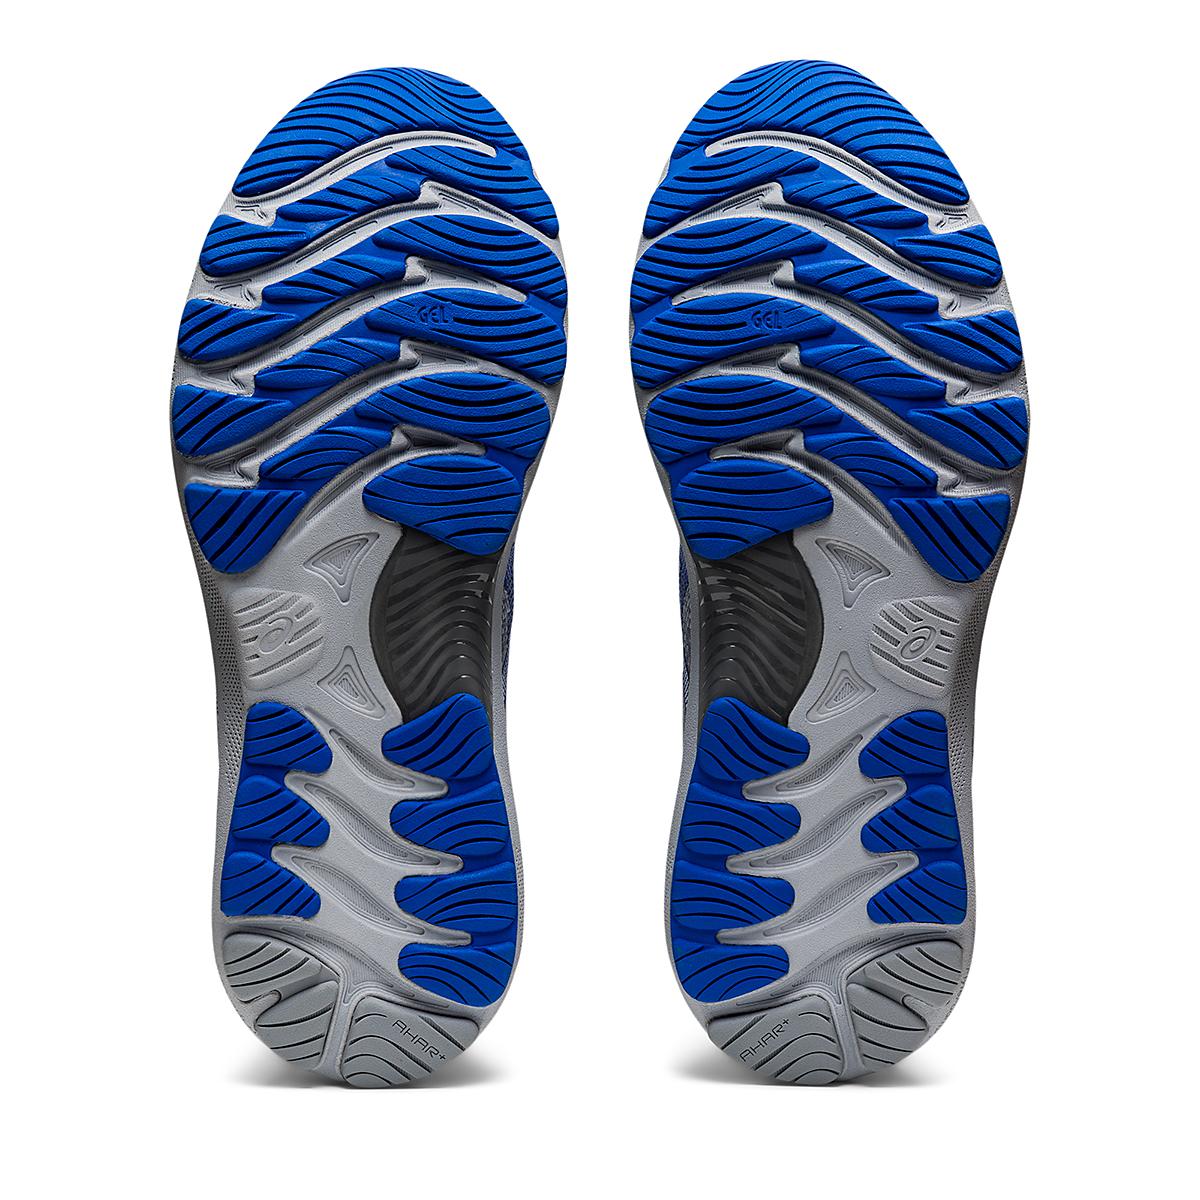 Men's Asics Gel-Nimbus 23 Running Shoe - Color: Piedmont Grey - Size: 6 - Width: Regular, Piedmont Grey, large, image 6